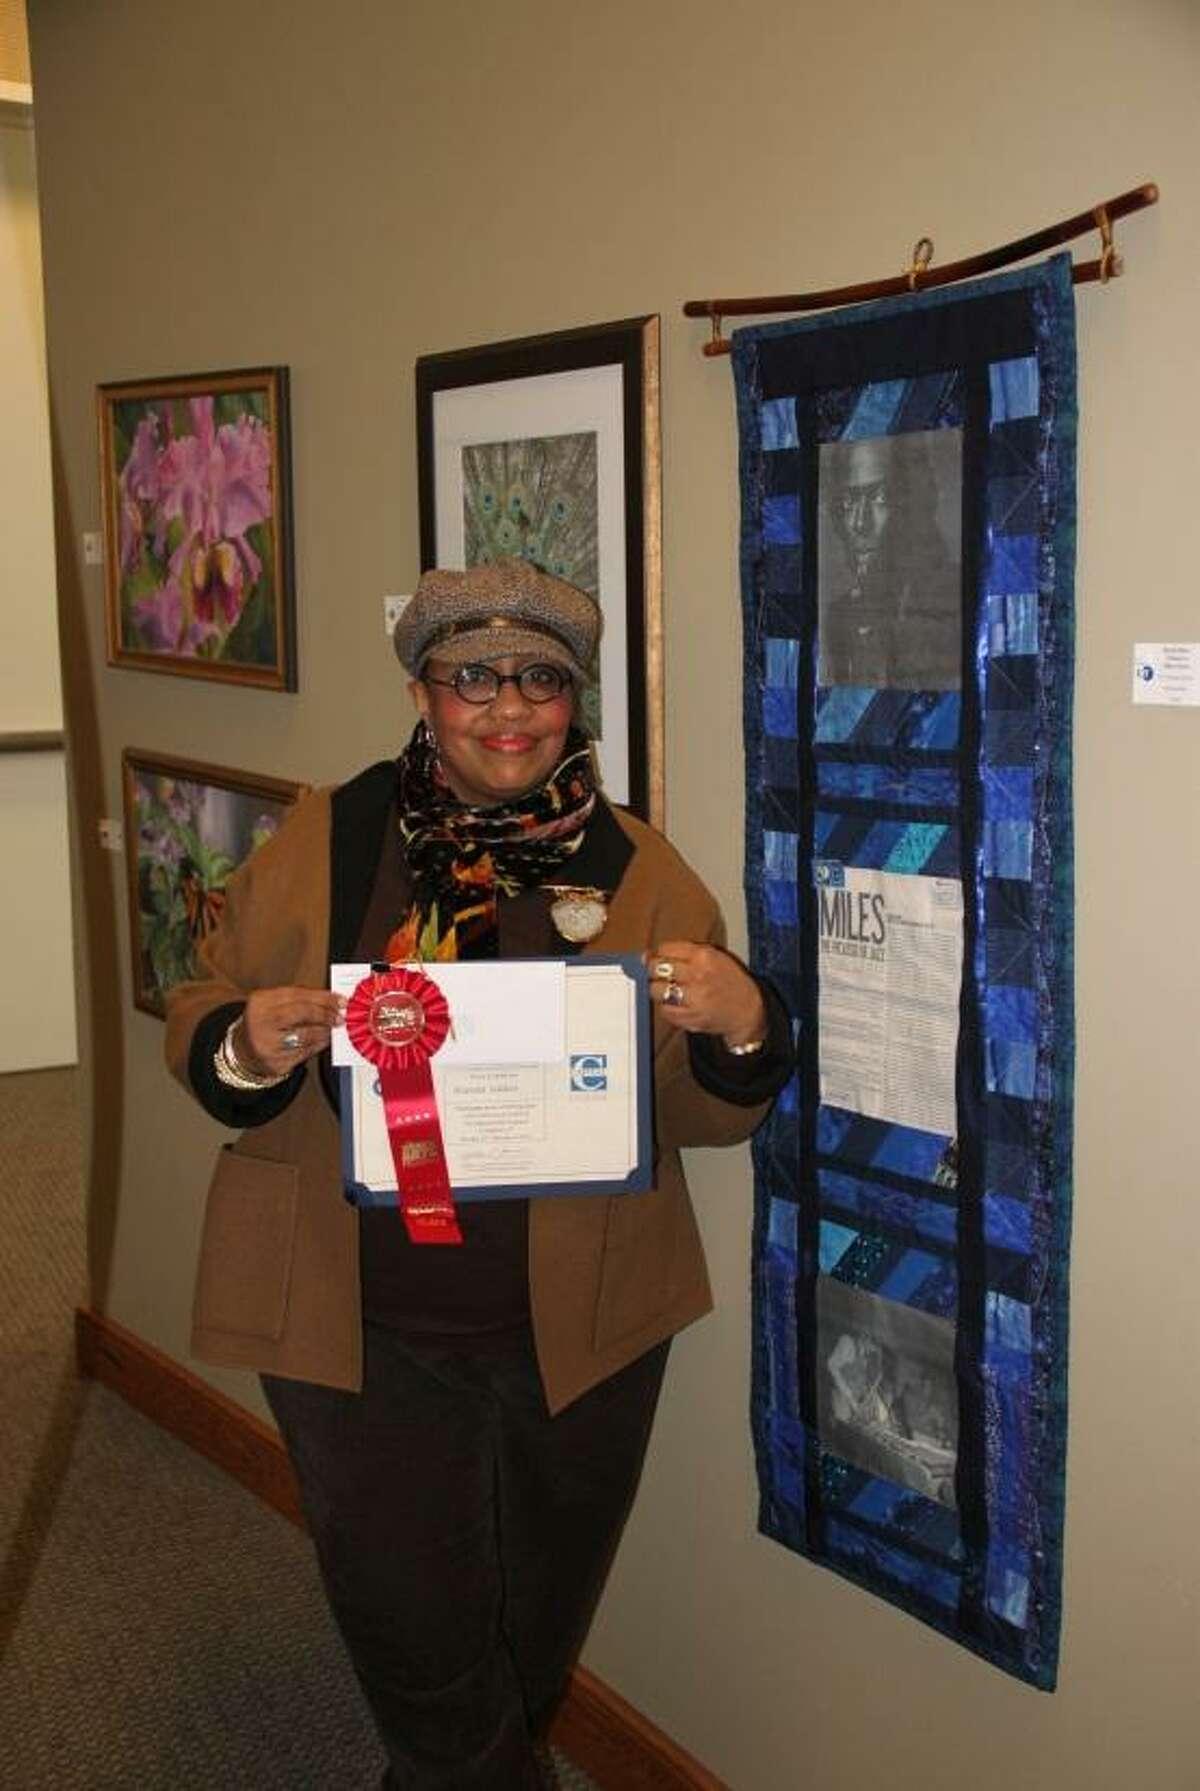 Wanda Seldon of Hartford displays her winning certificate from last year's show.